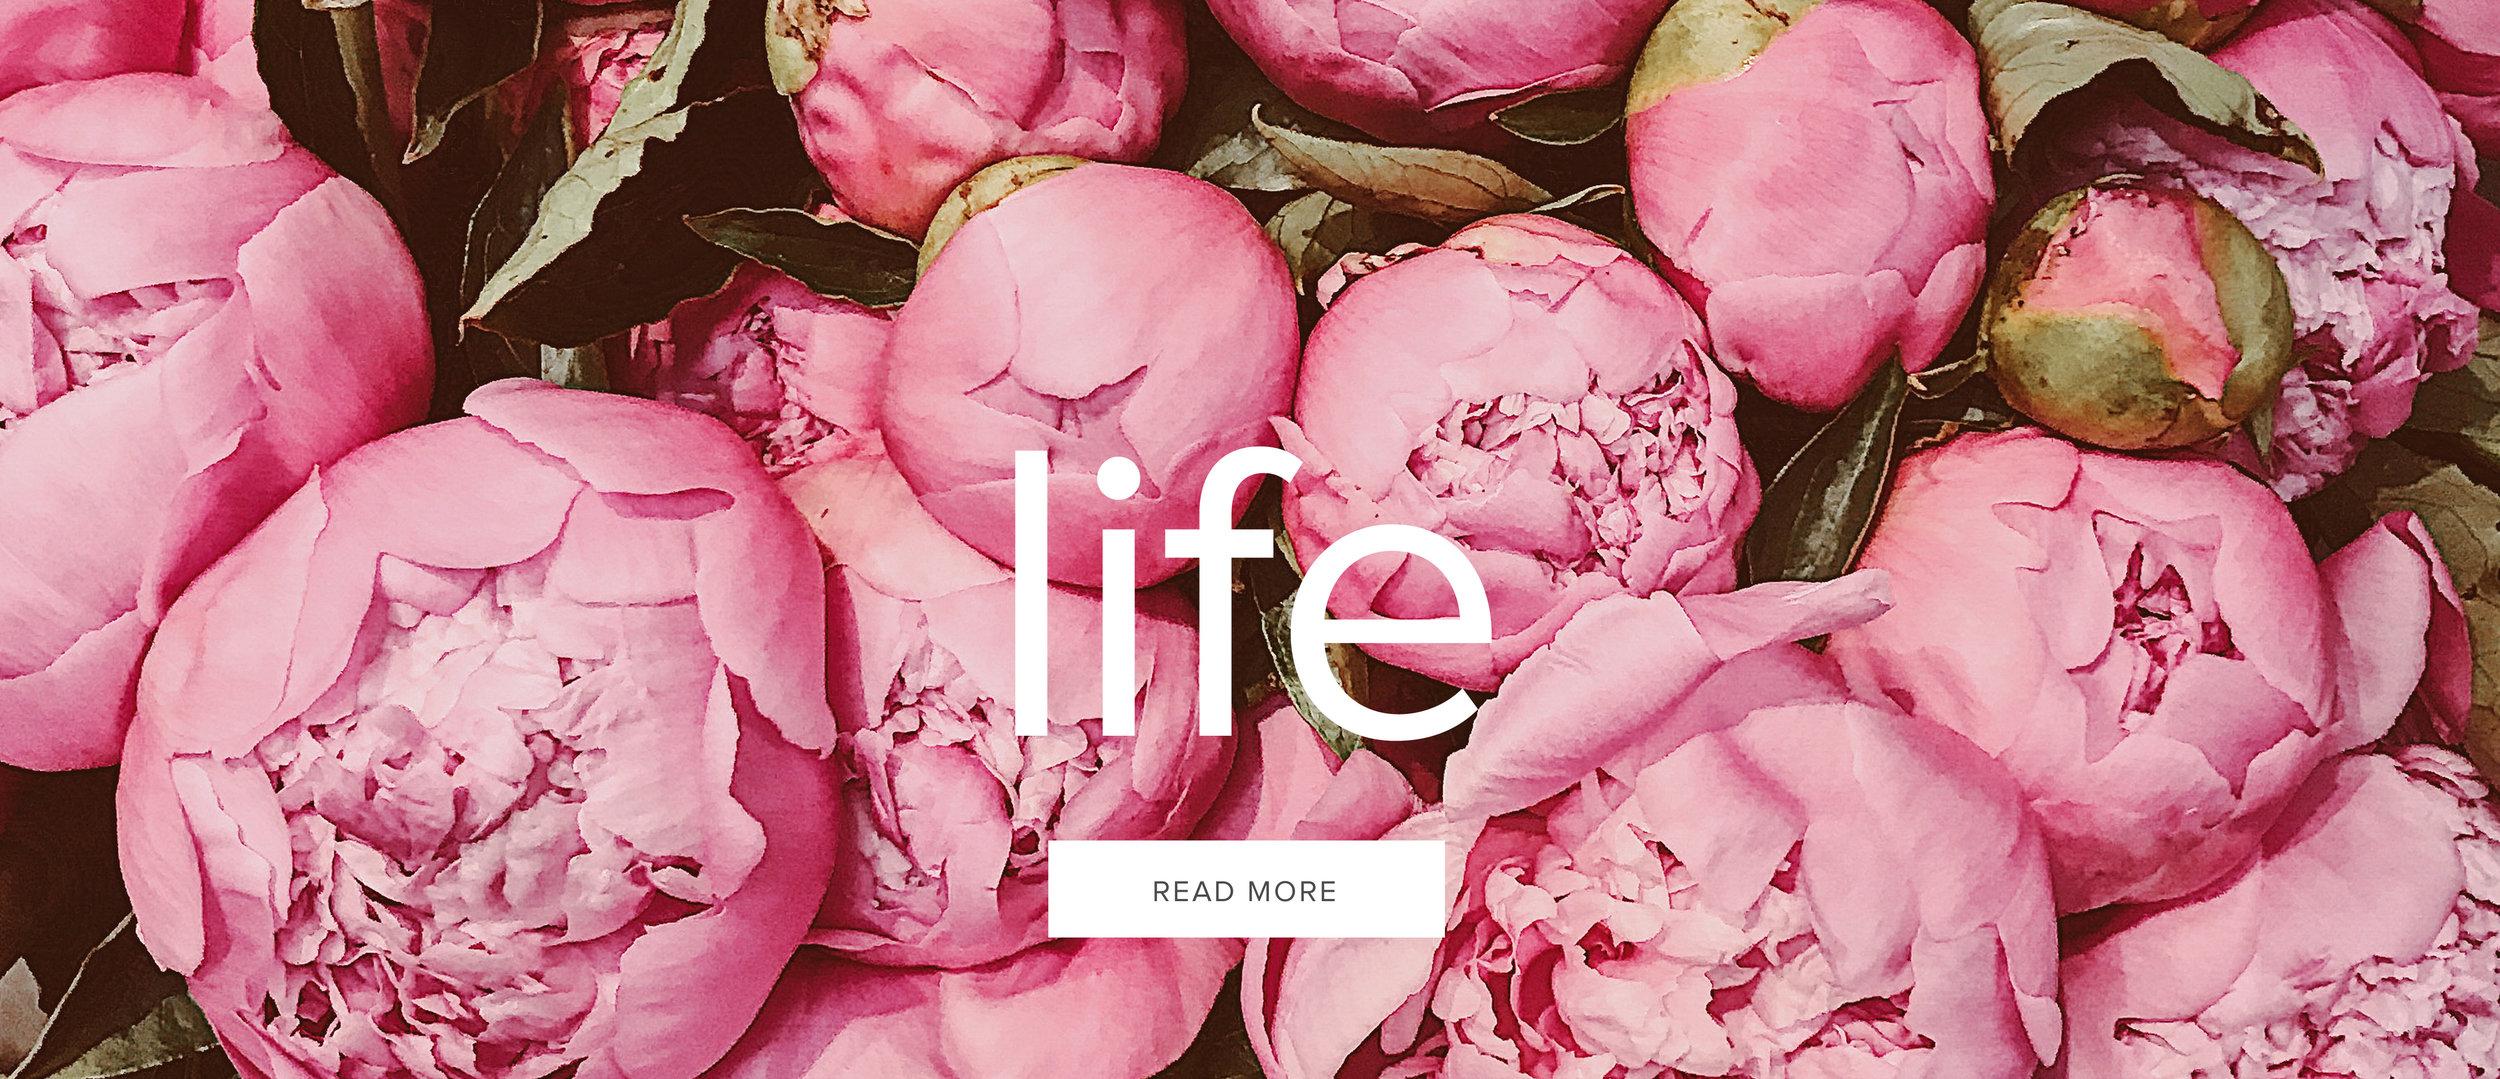 laurennicolefoot-blog-arizona-featurepanel-life-1.jpg